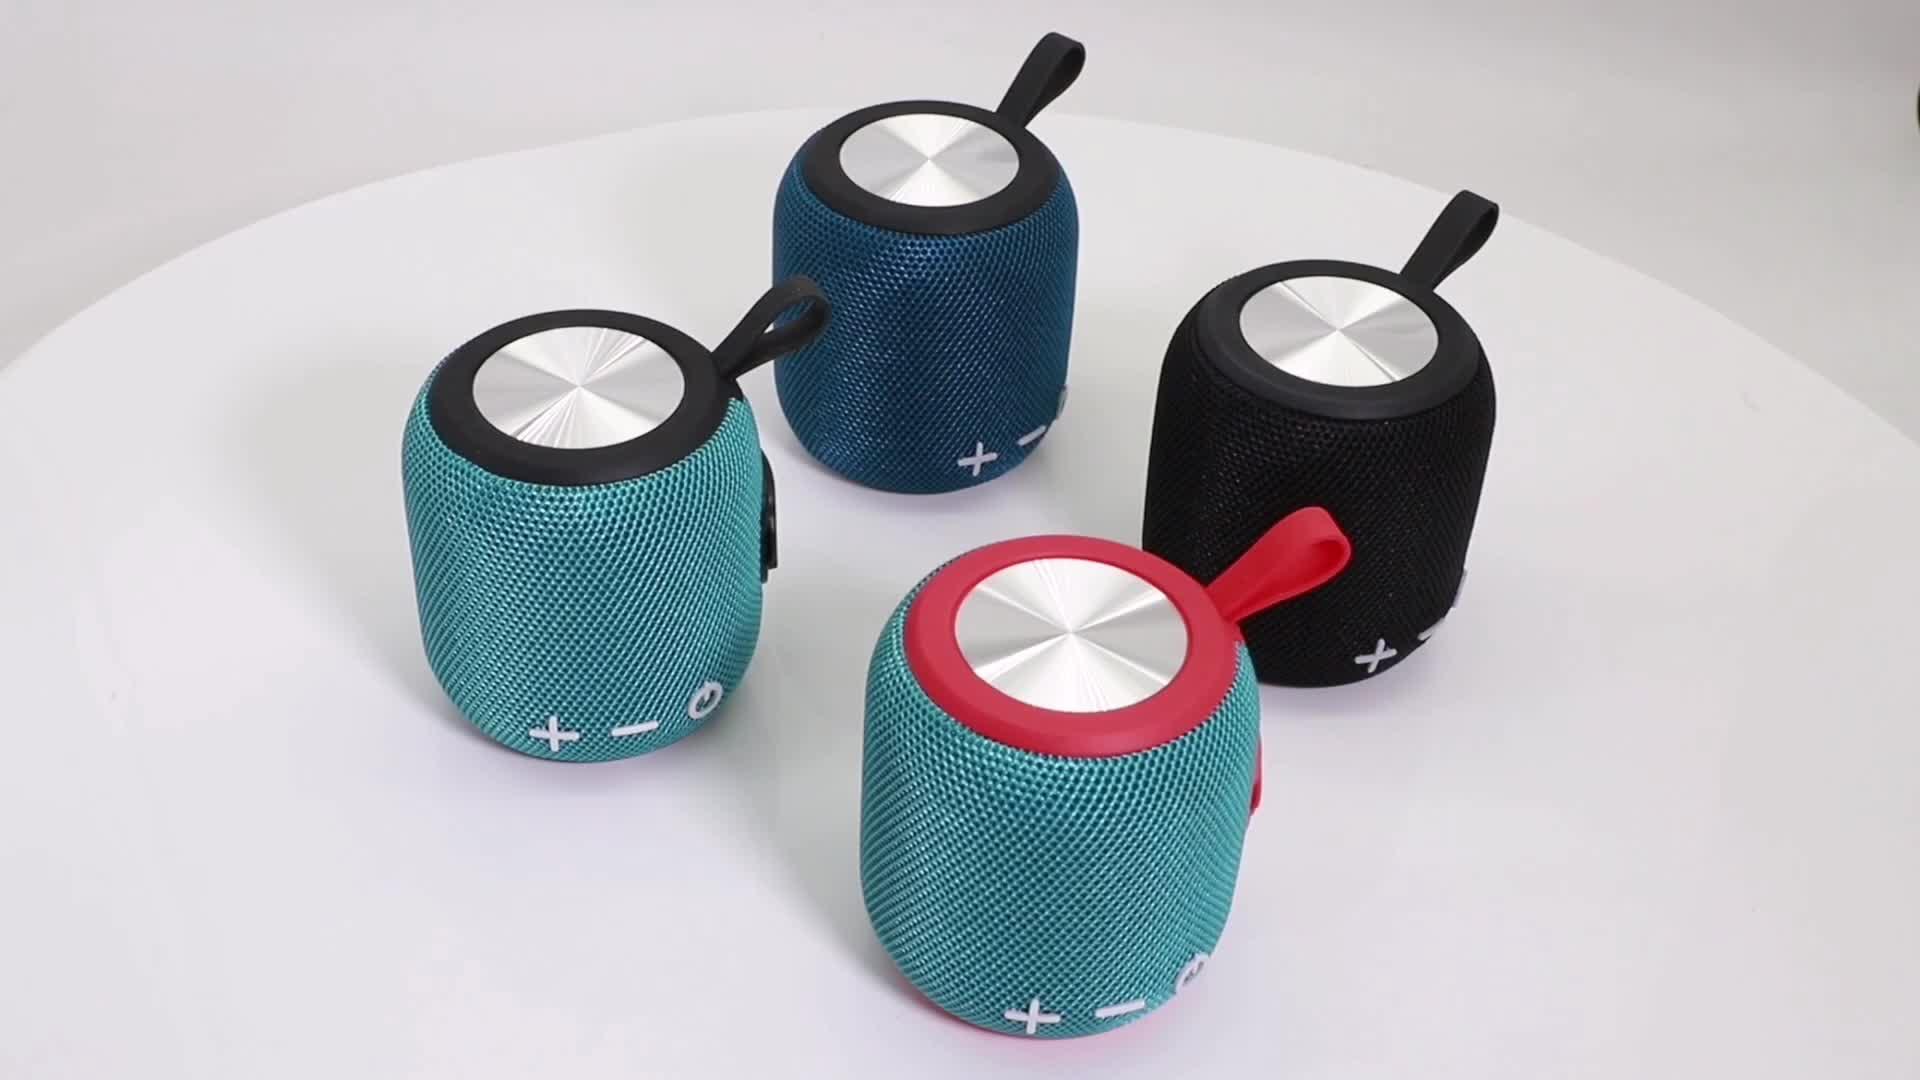 Wasserdichter tragbarer Bluetooth-Lautsprecher Ipx7 2018